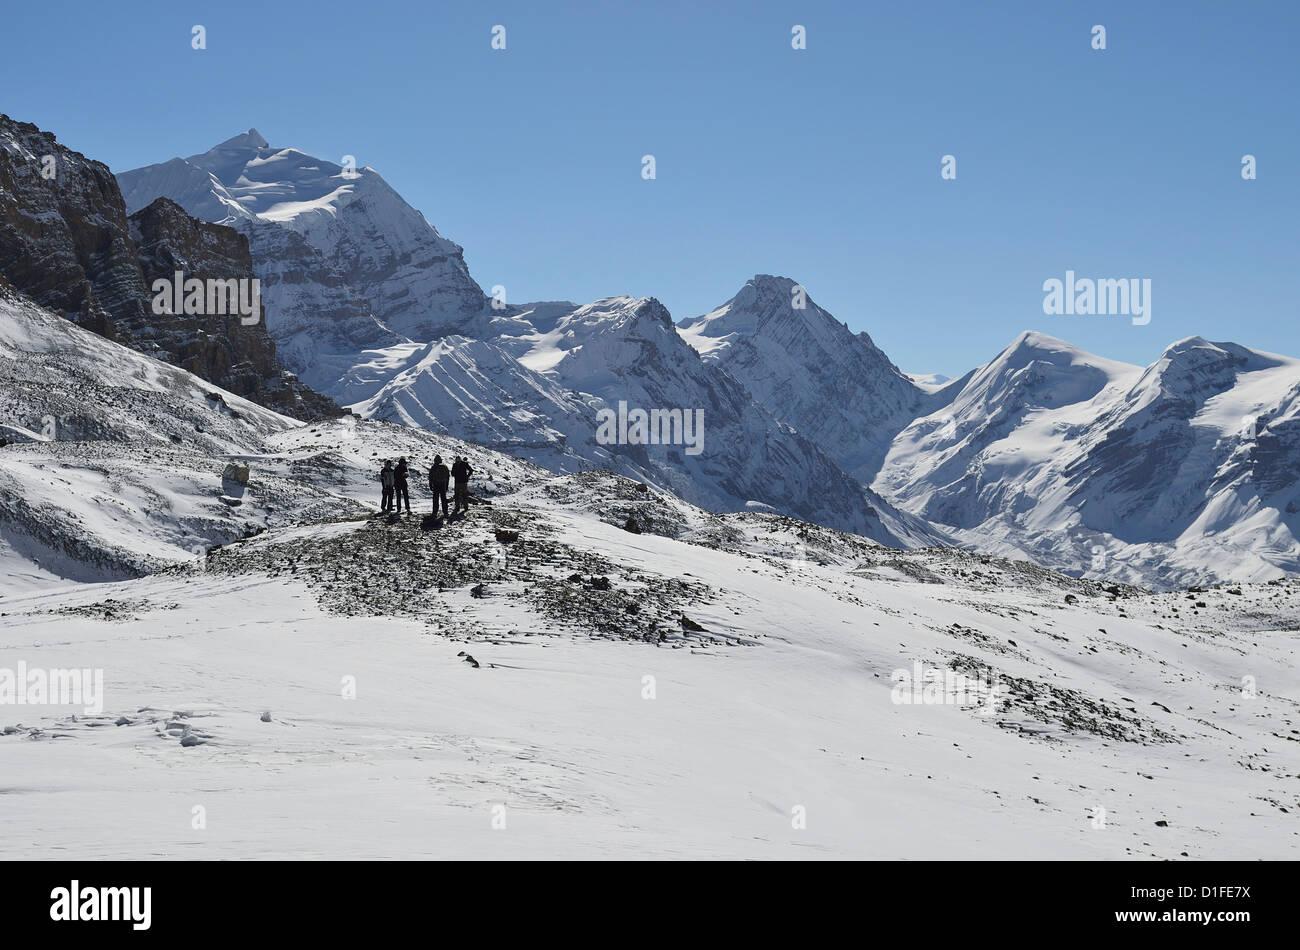 Thorong La (Thorung La), pass at 5416m, Annapurna Conservation Area, Gandaki, Western Region (Pashchimanchal), Nepal, - Stock Image